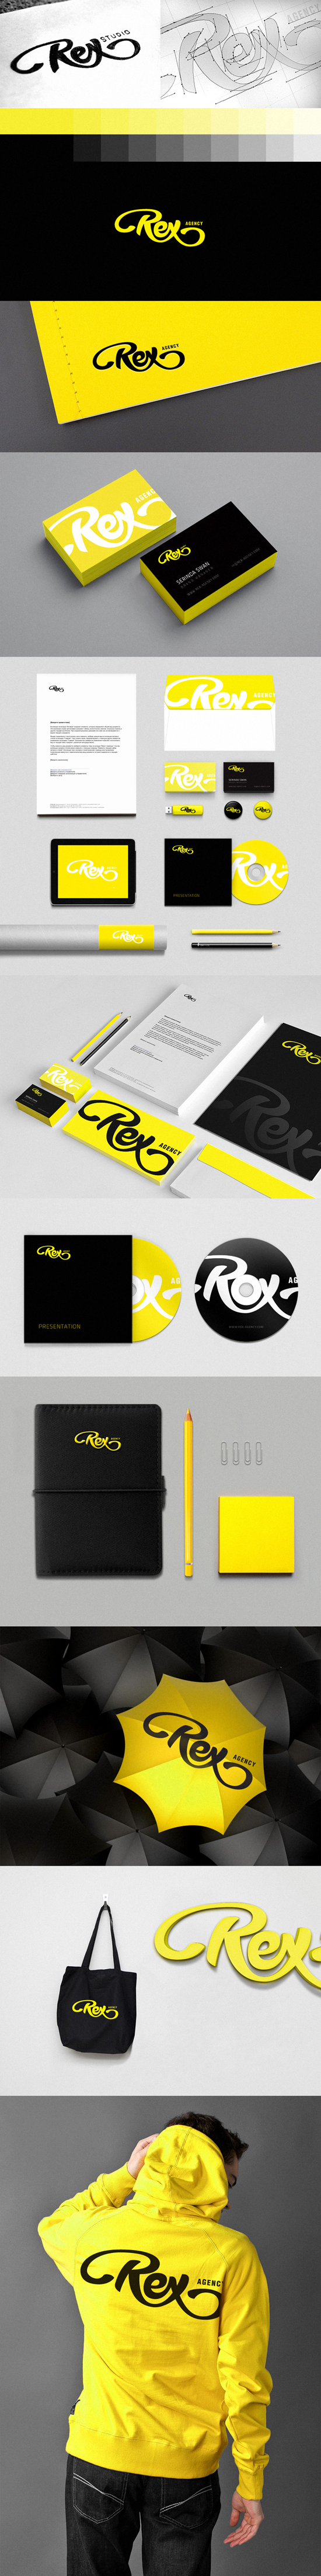 REX Identity by Sapelkin. #design #identity #branding